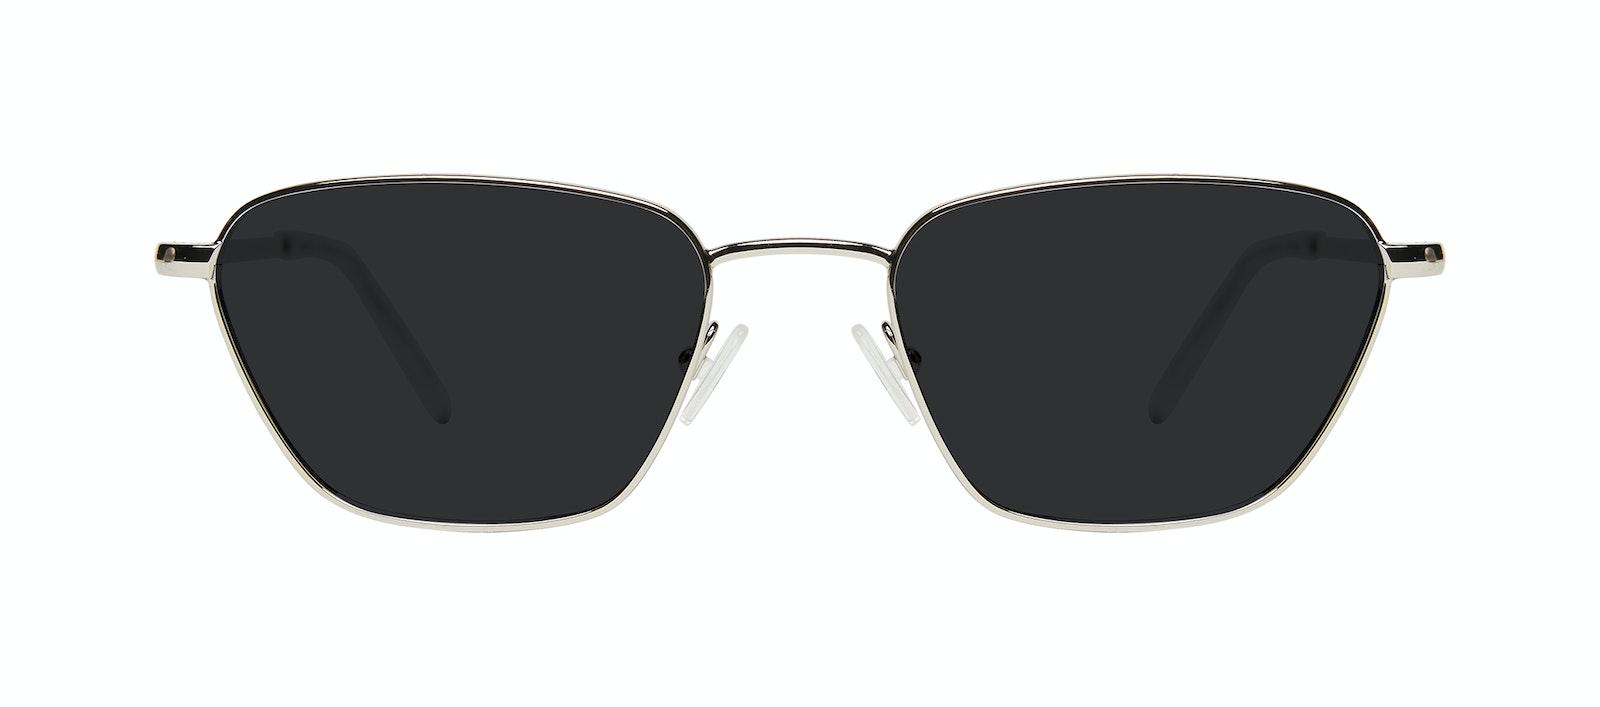 Affordable Fashion Glasses Square Sunglasses Women Venice Silver Front